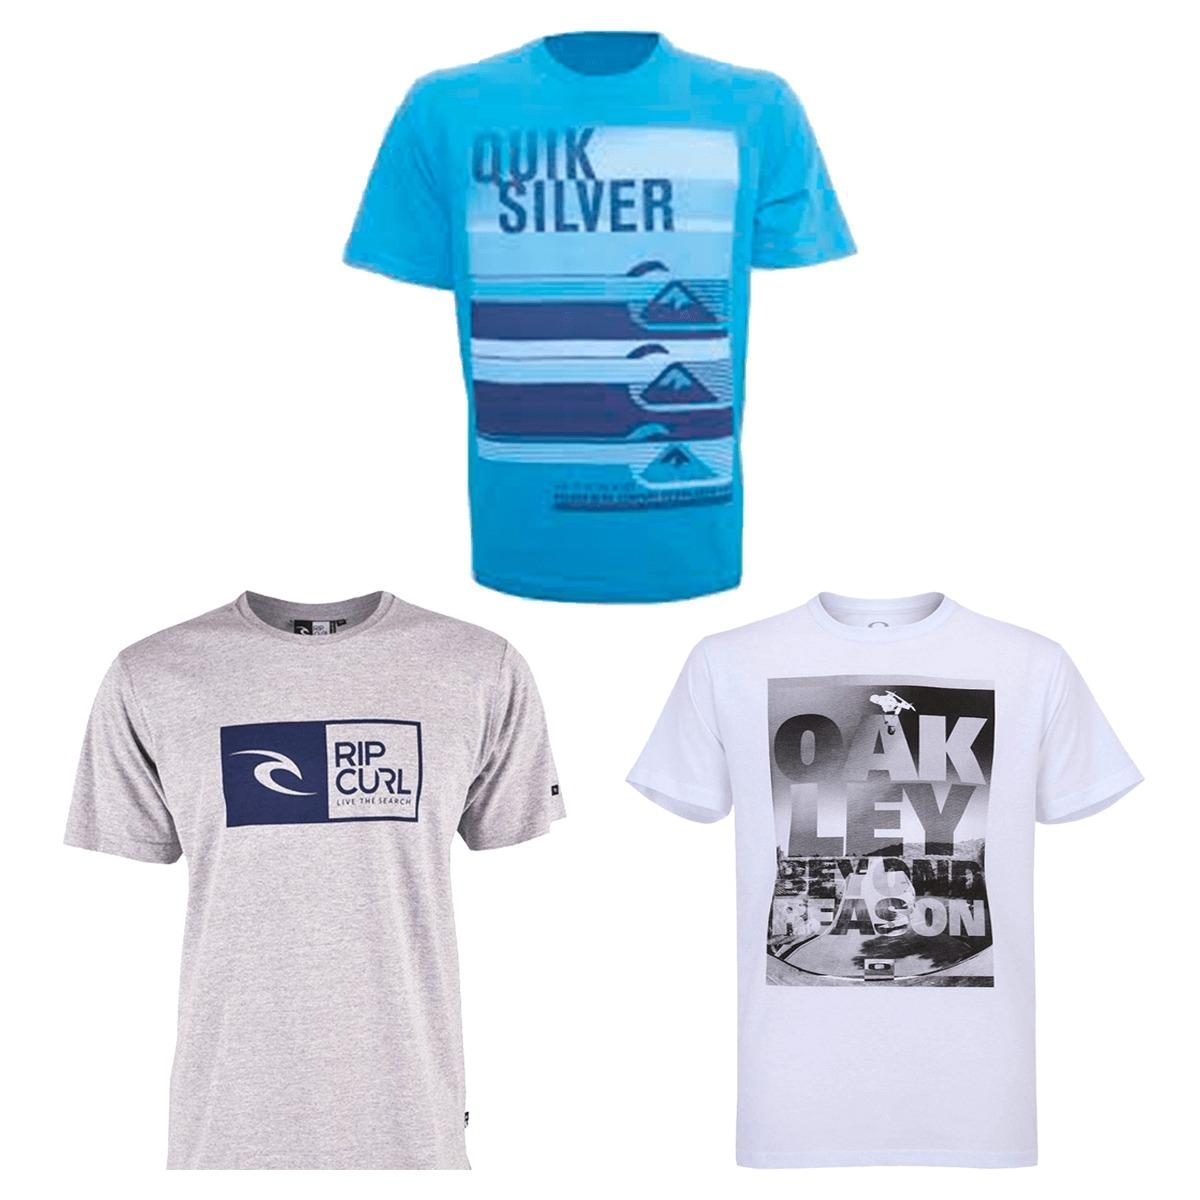 kit 10 camisa camiseta masculina marca estampada top revenda. Carregando  zoom. a4d8b61769c